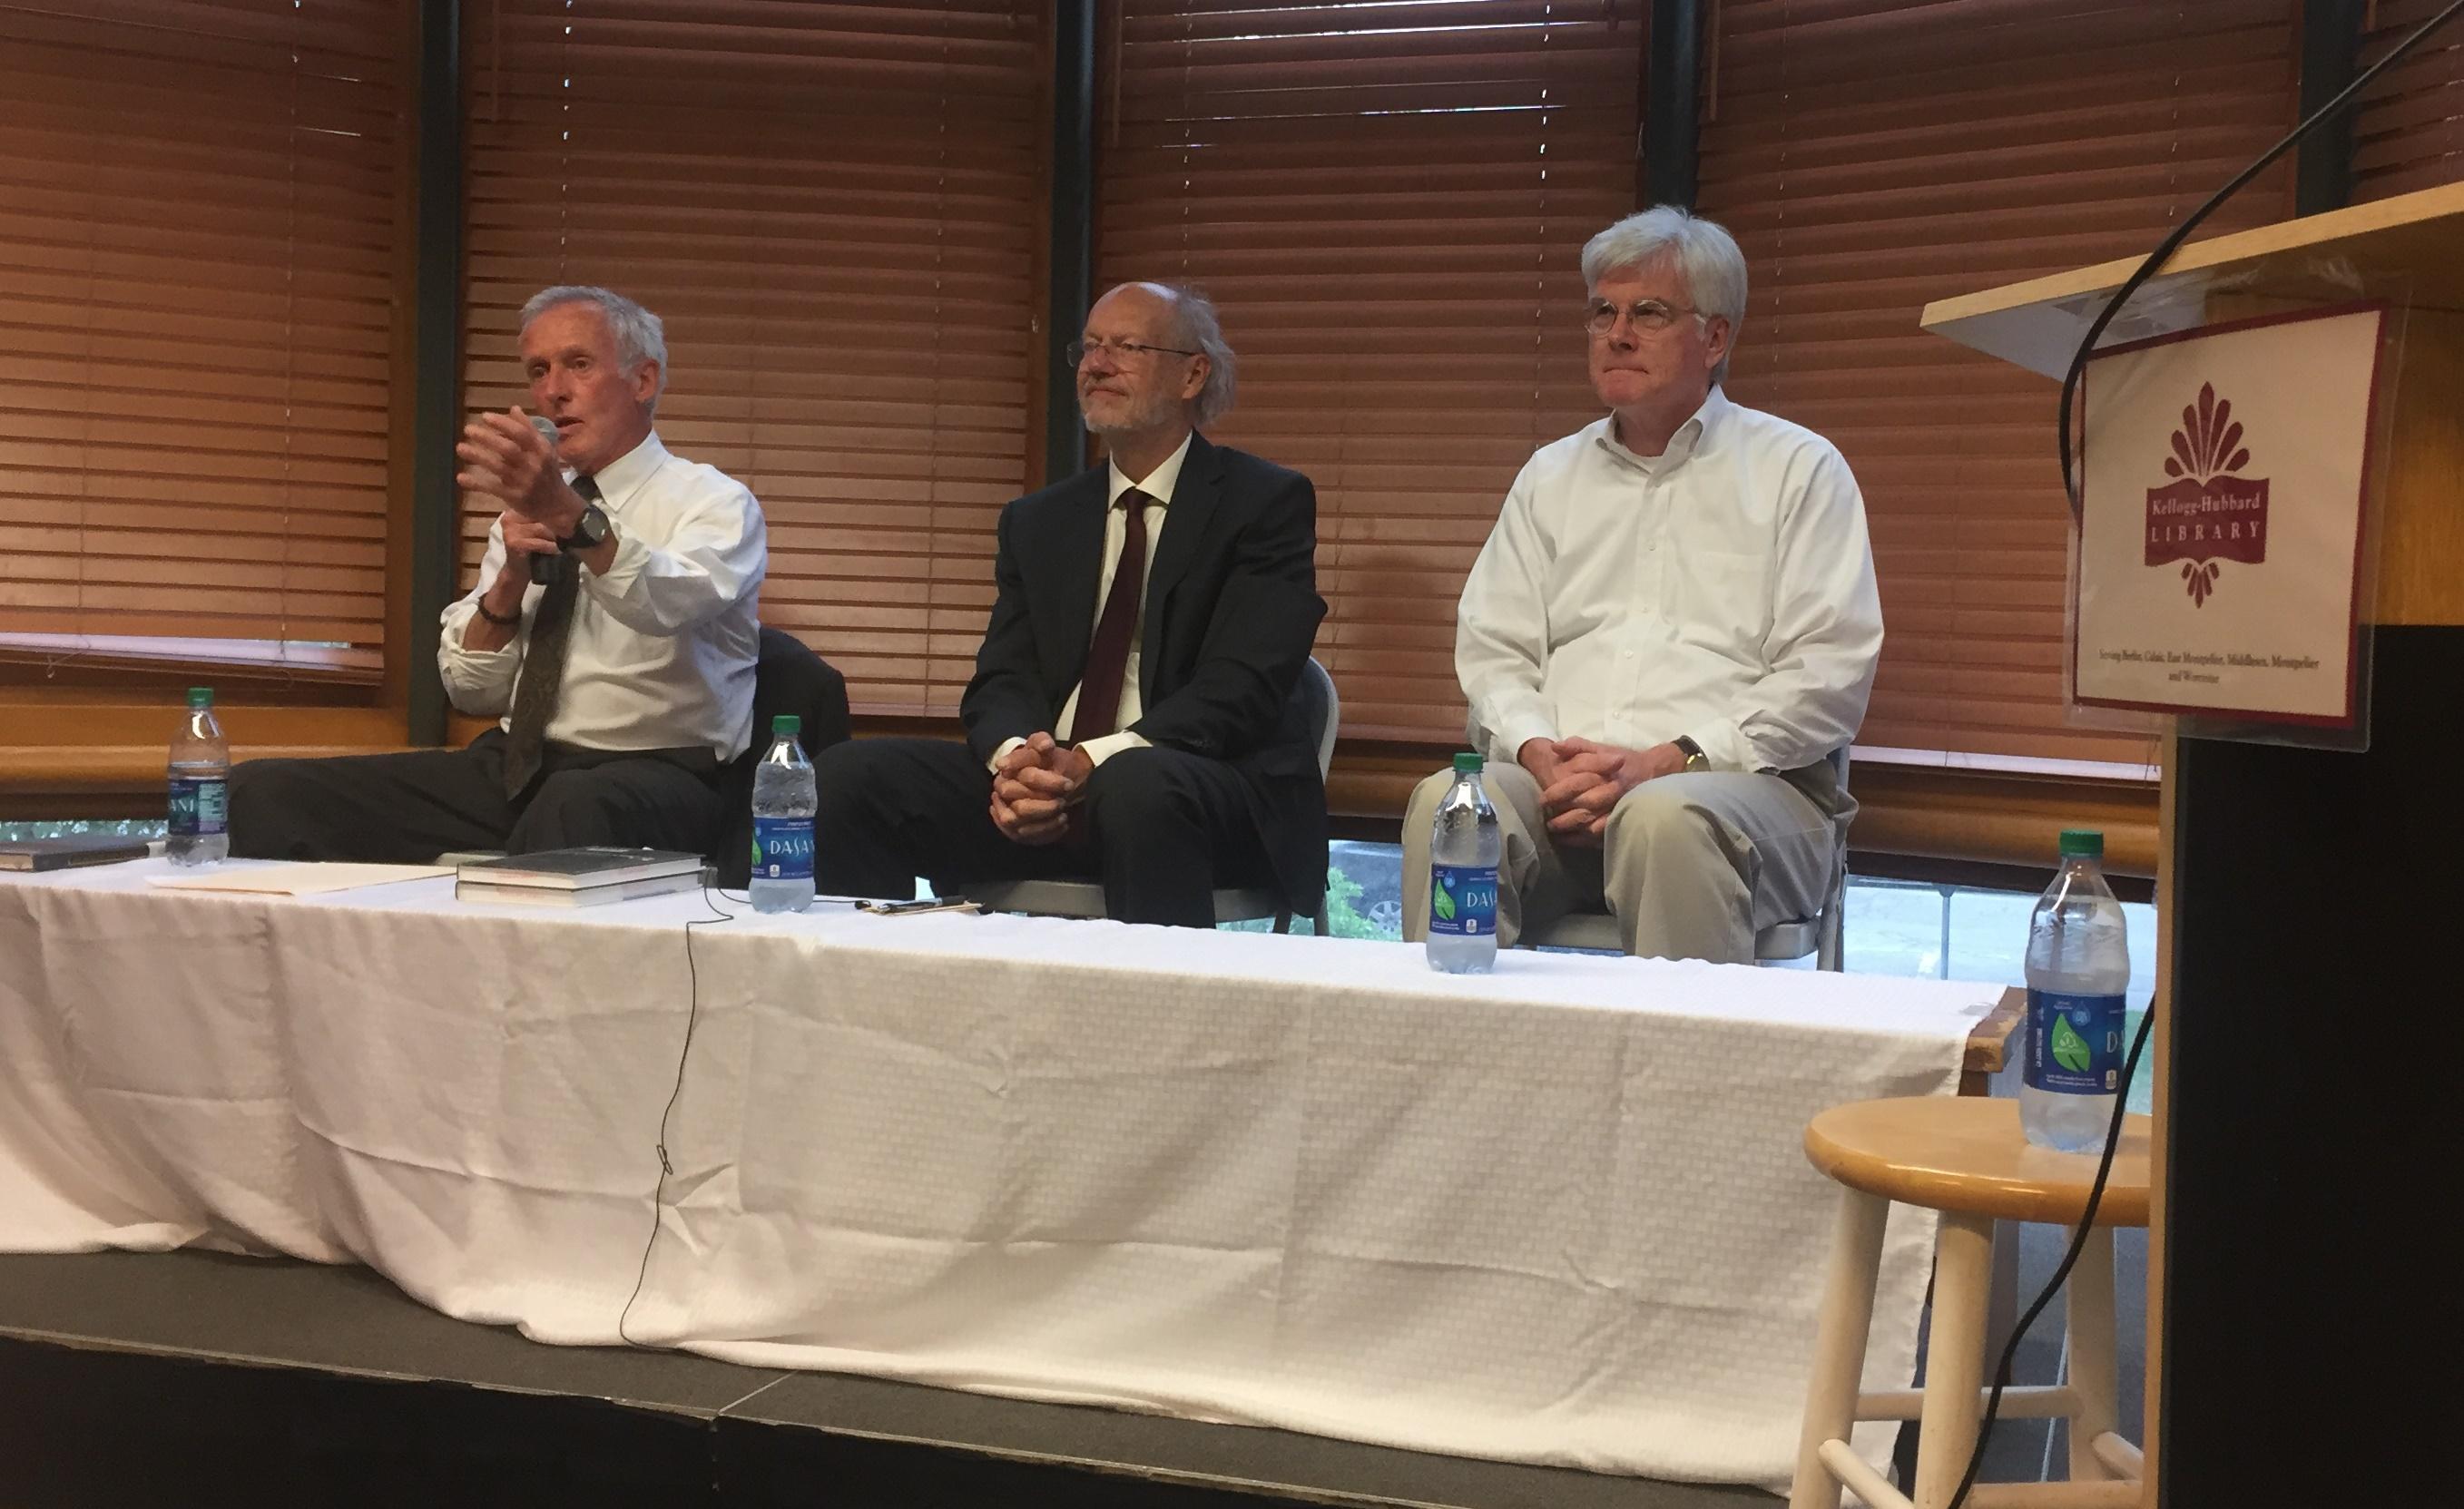 Panelists Professor Peter Teachout, attorneys Paul Gillies, John Franco